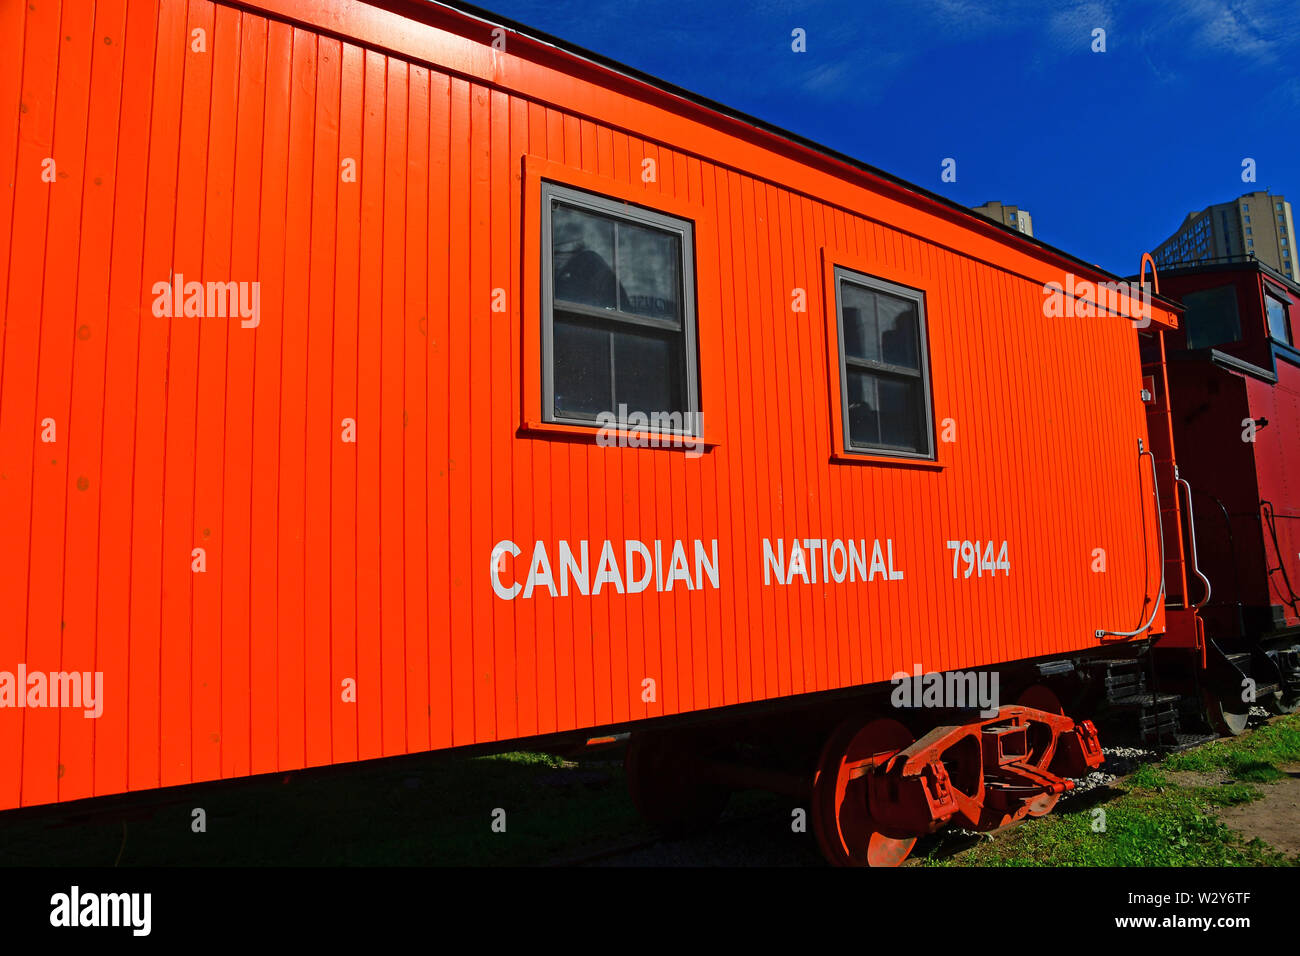 Canadian National Train Stock Photos & Canadian National